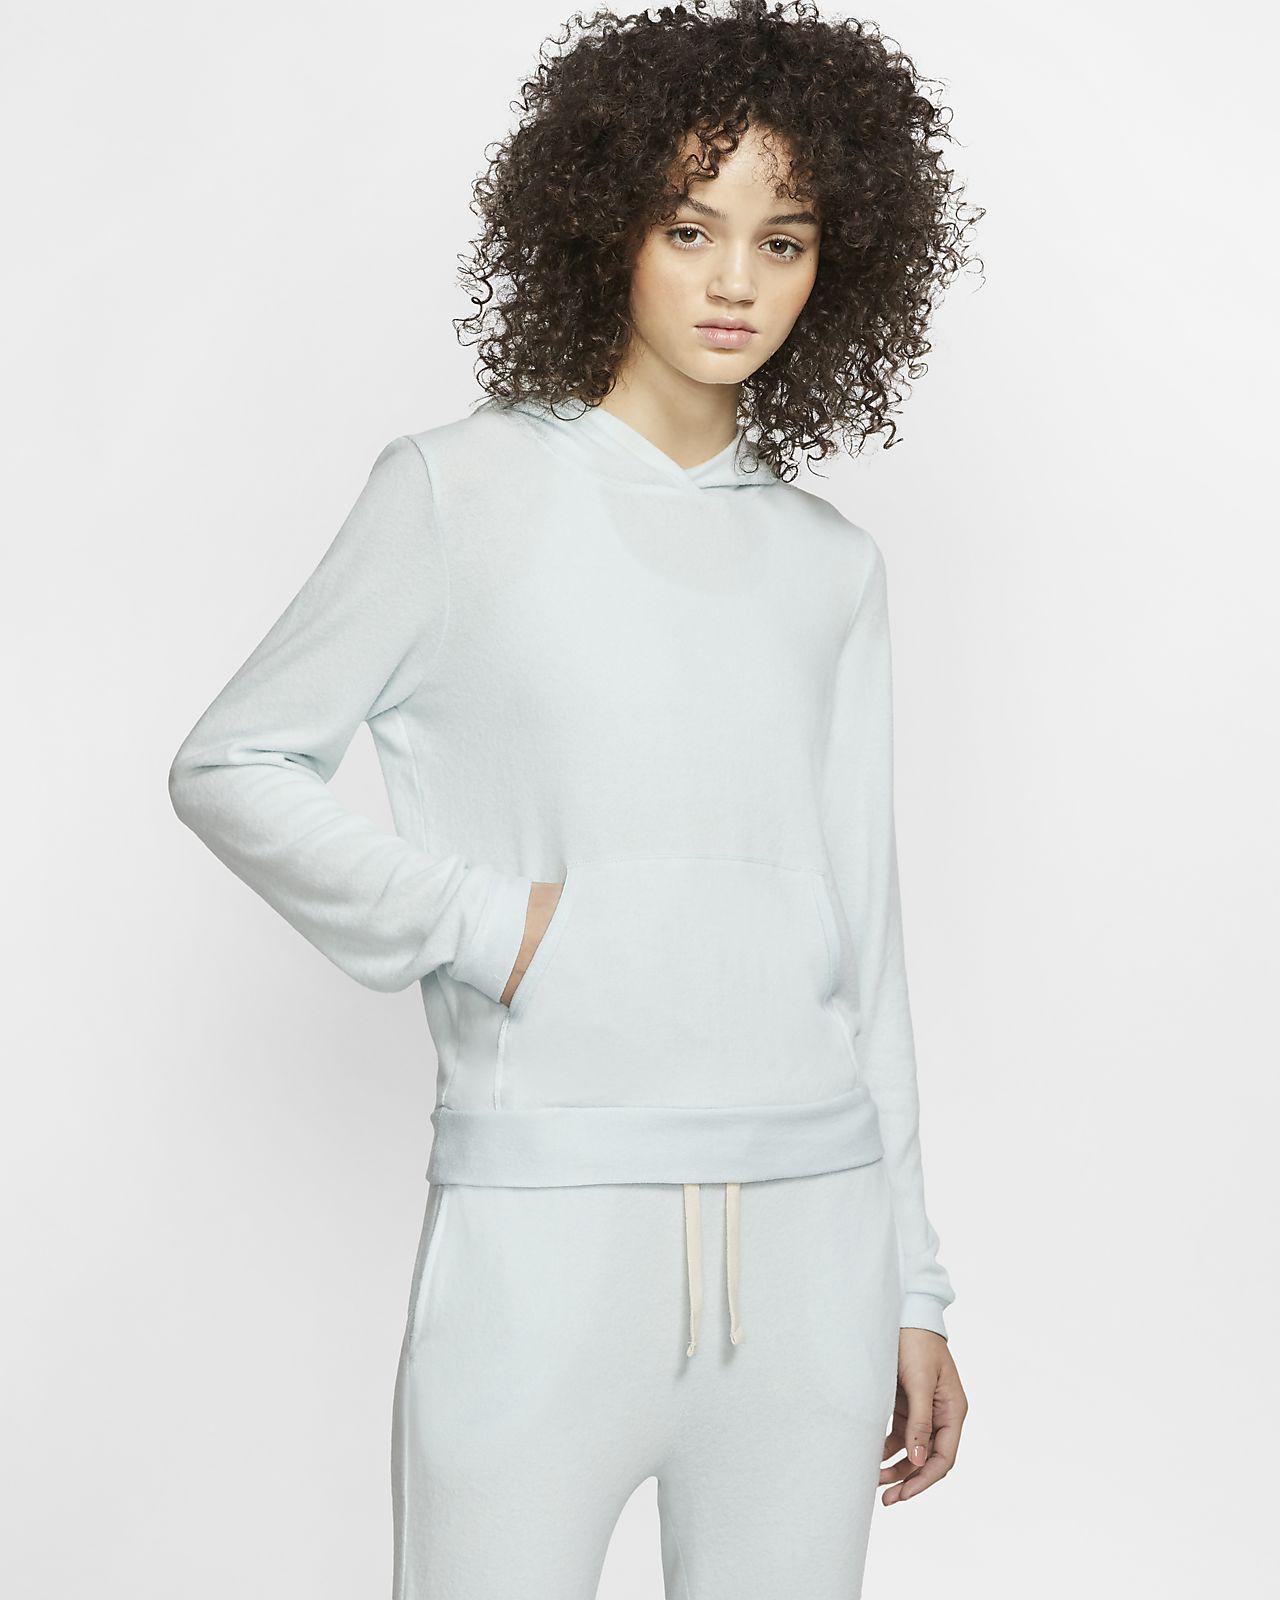 Hurley Chill Sudadera de tejido Fleece - Mujer